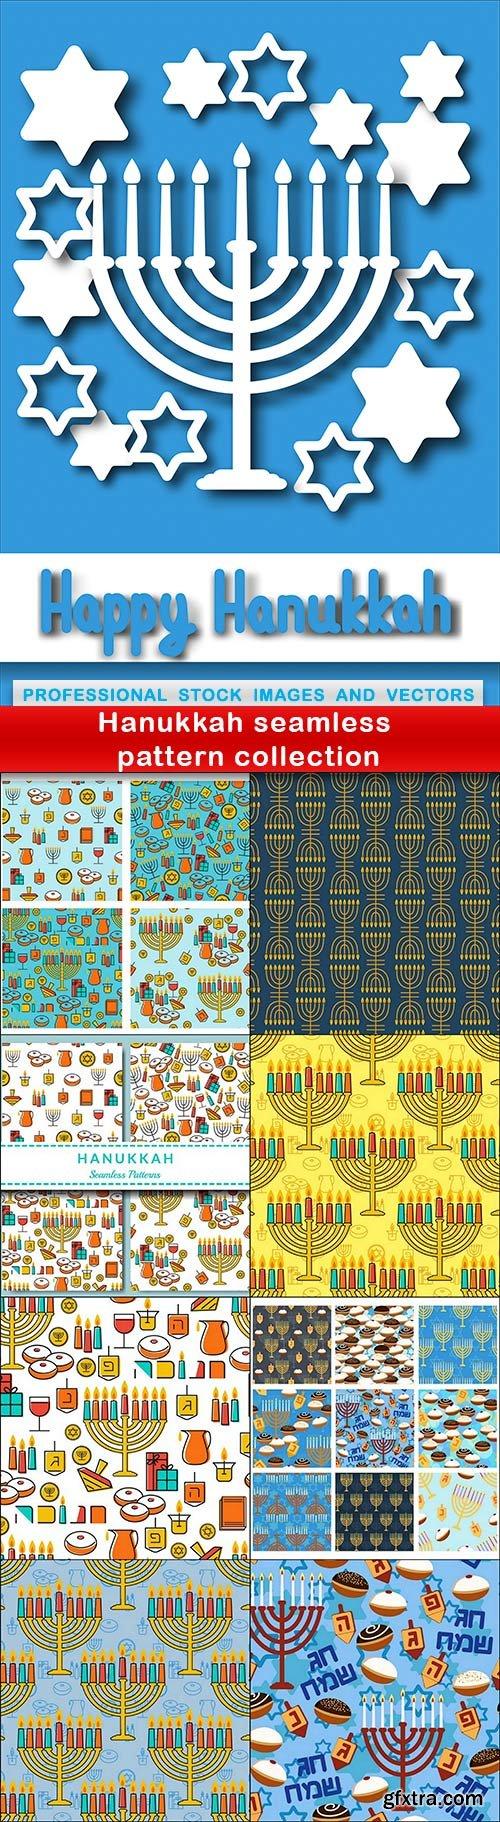 Hanukkah seamless pattern collection - 9 EPS